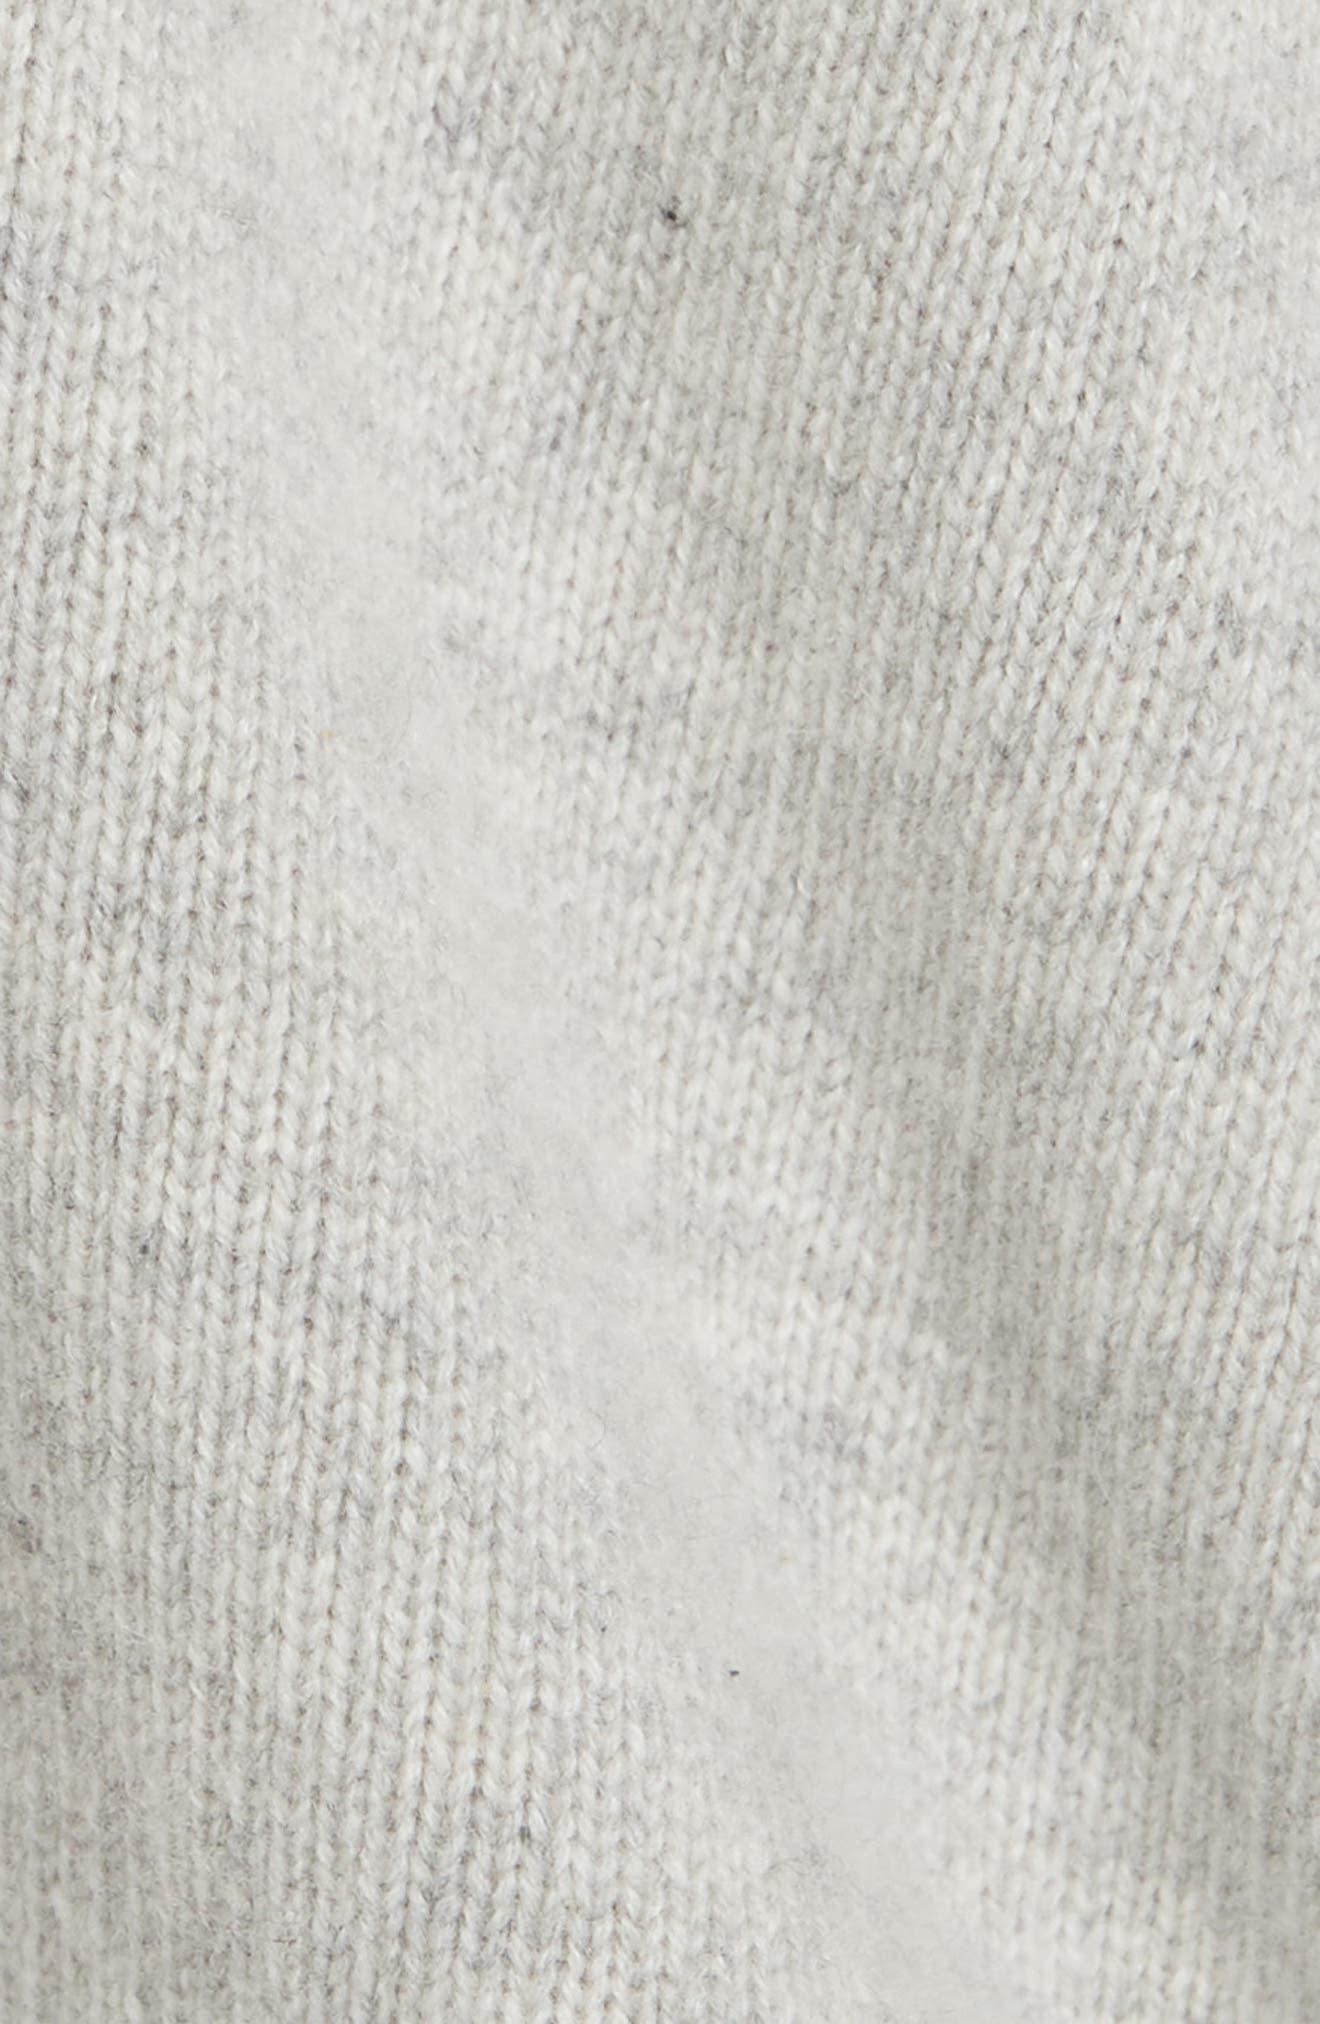 One Shoulder Slit Pullover Sweater,                             Alternate thumbnail 5, color,                             LIGHT HEATHER GREY